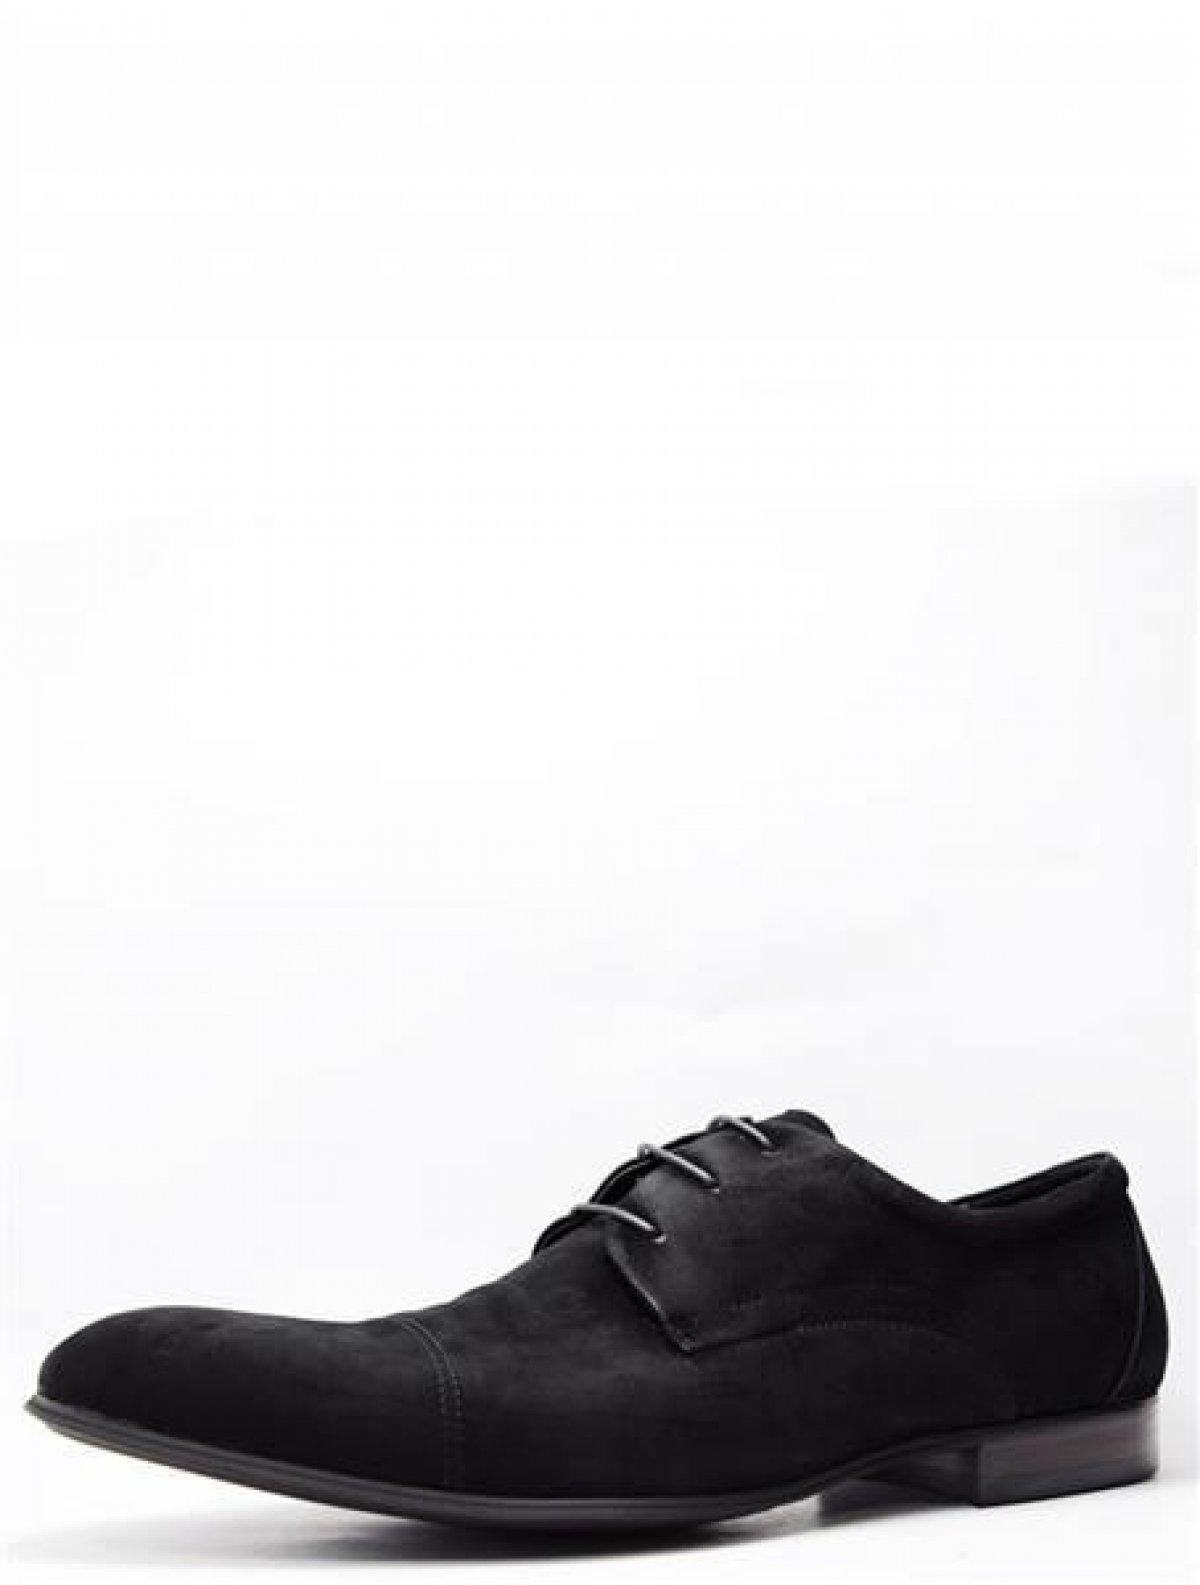 S83-065371 мужские туфли